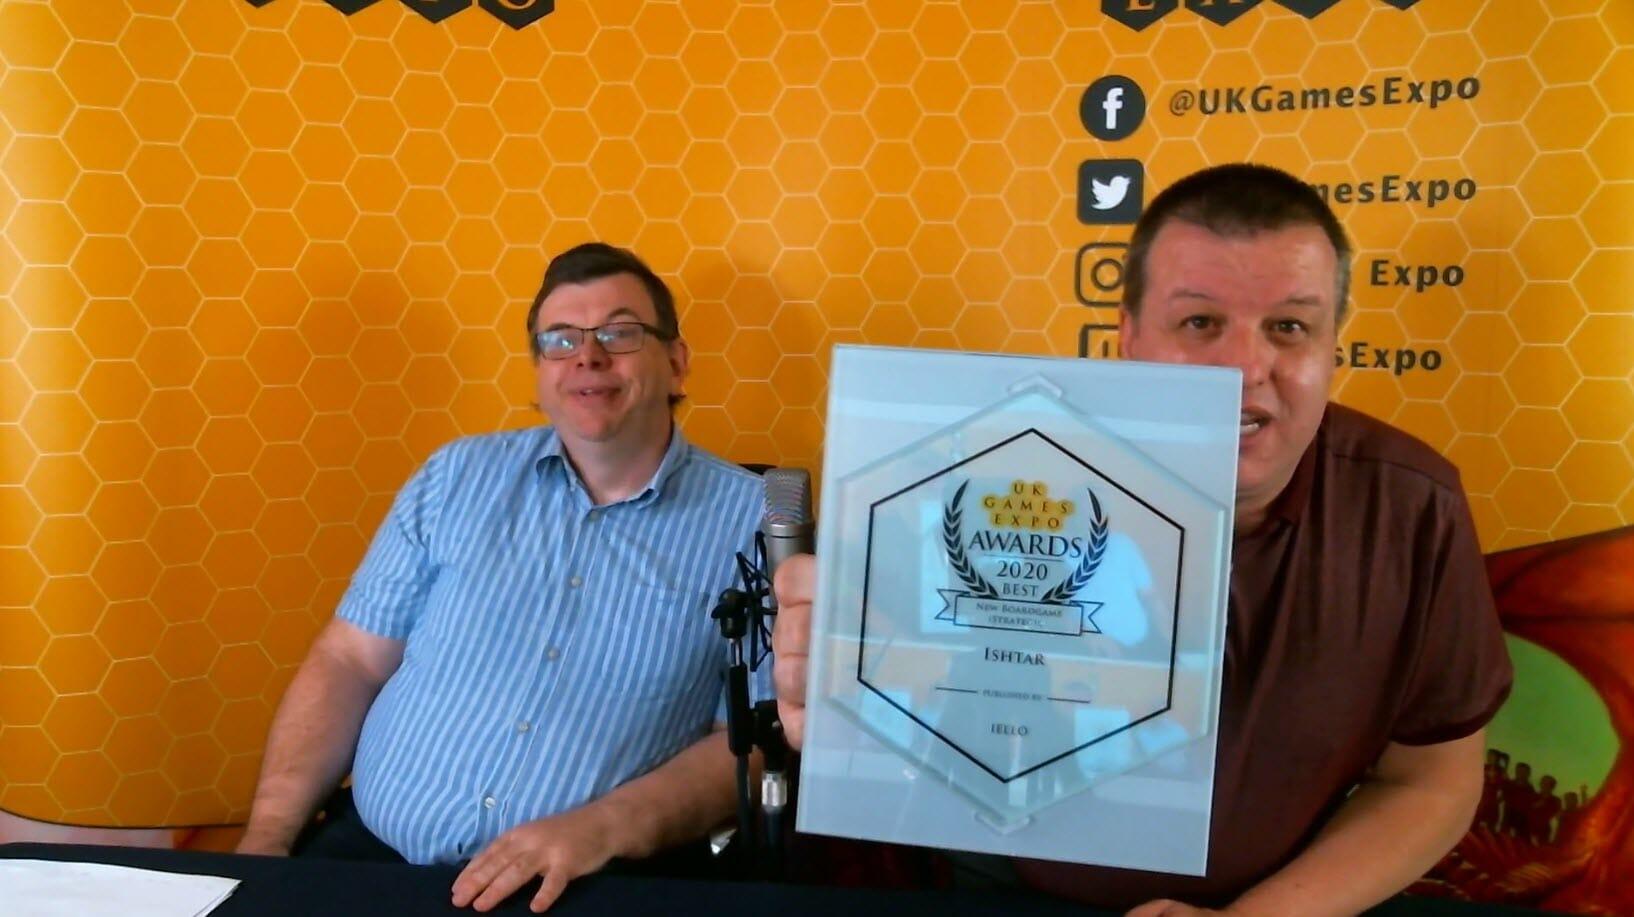 UK Games Expo Awards 2020